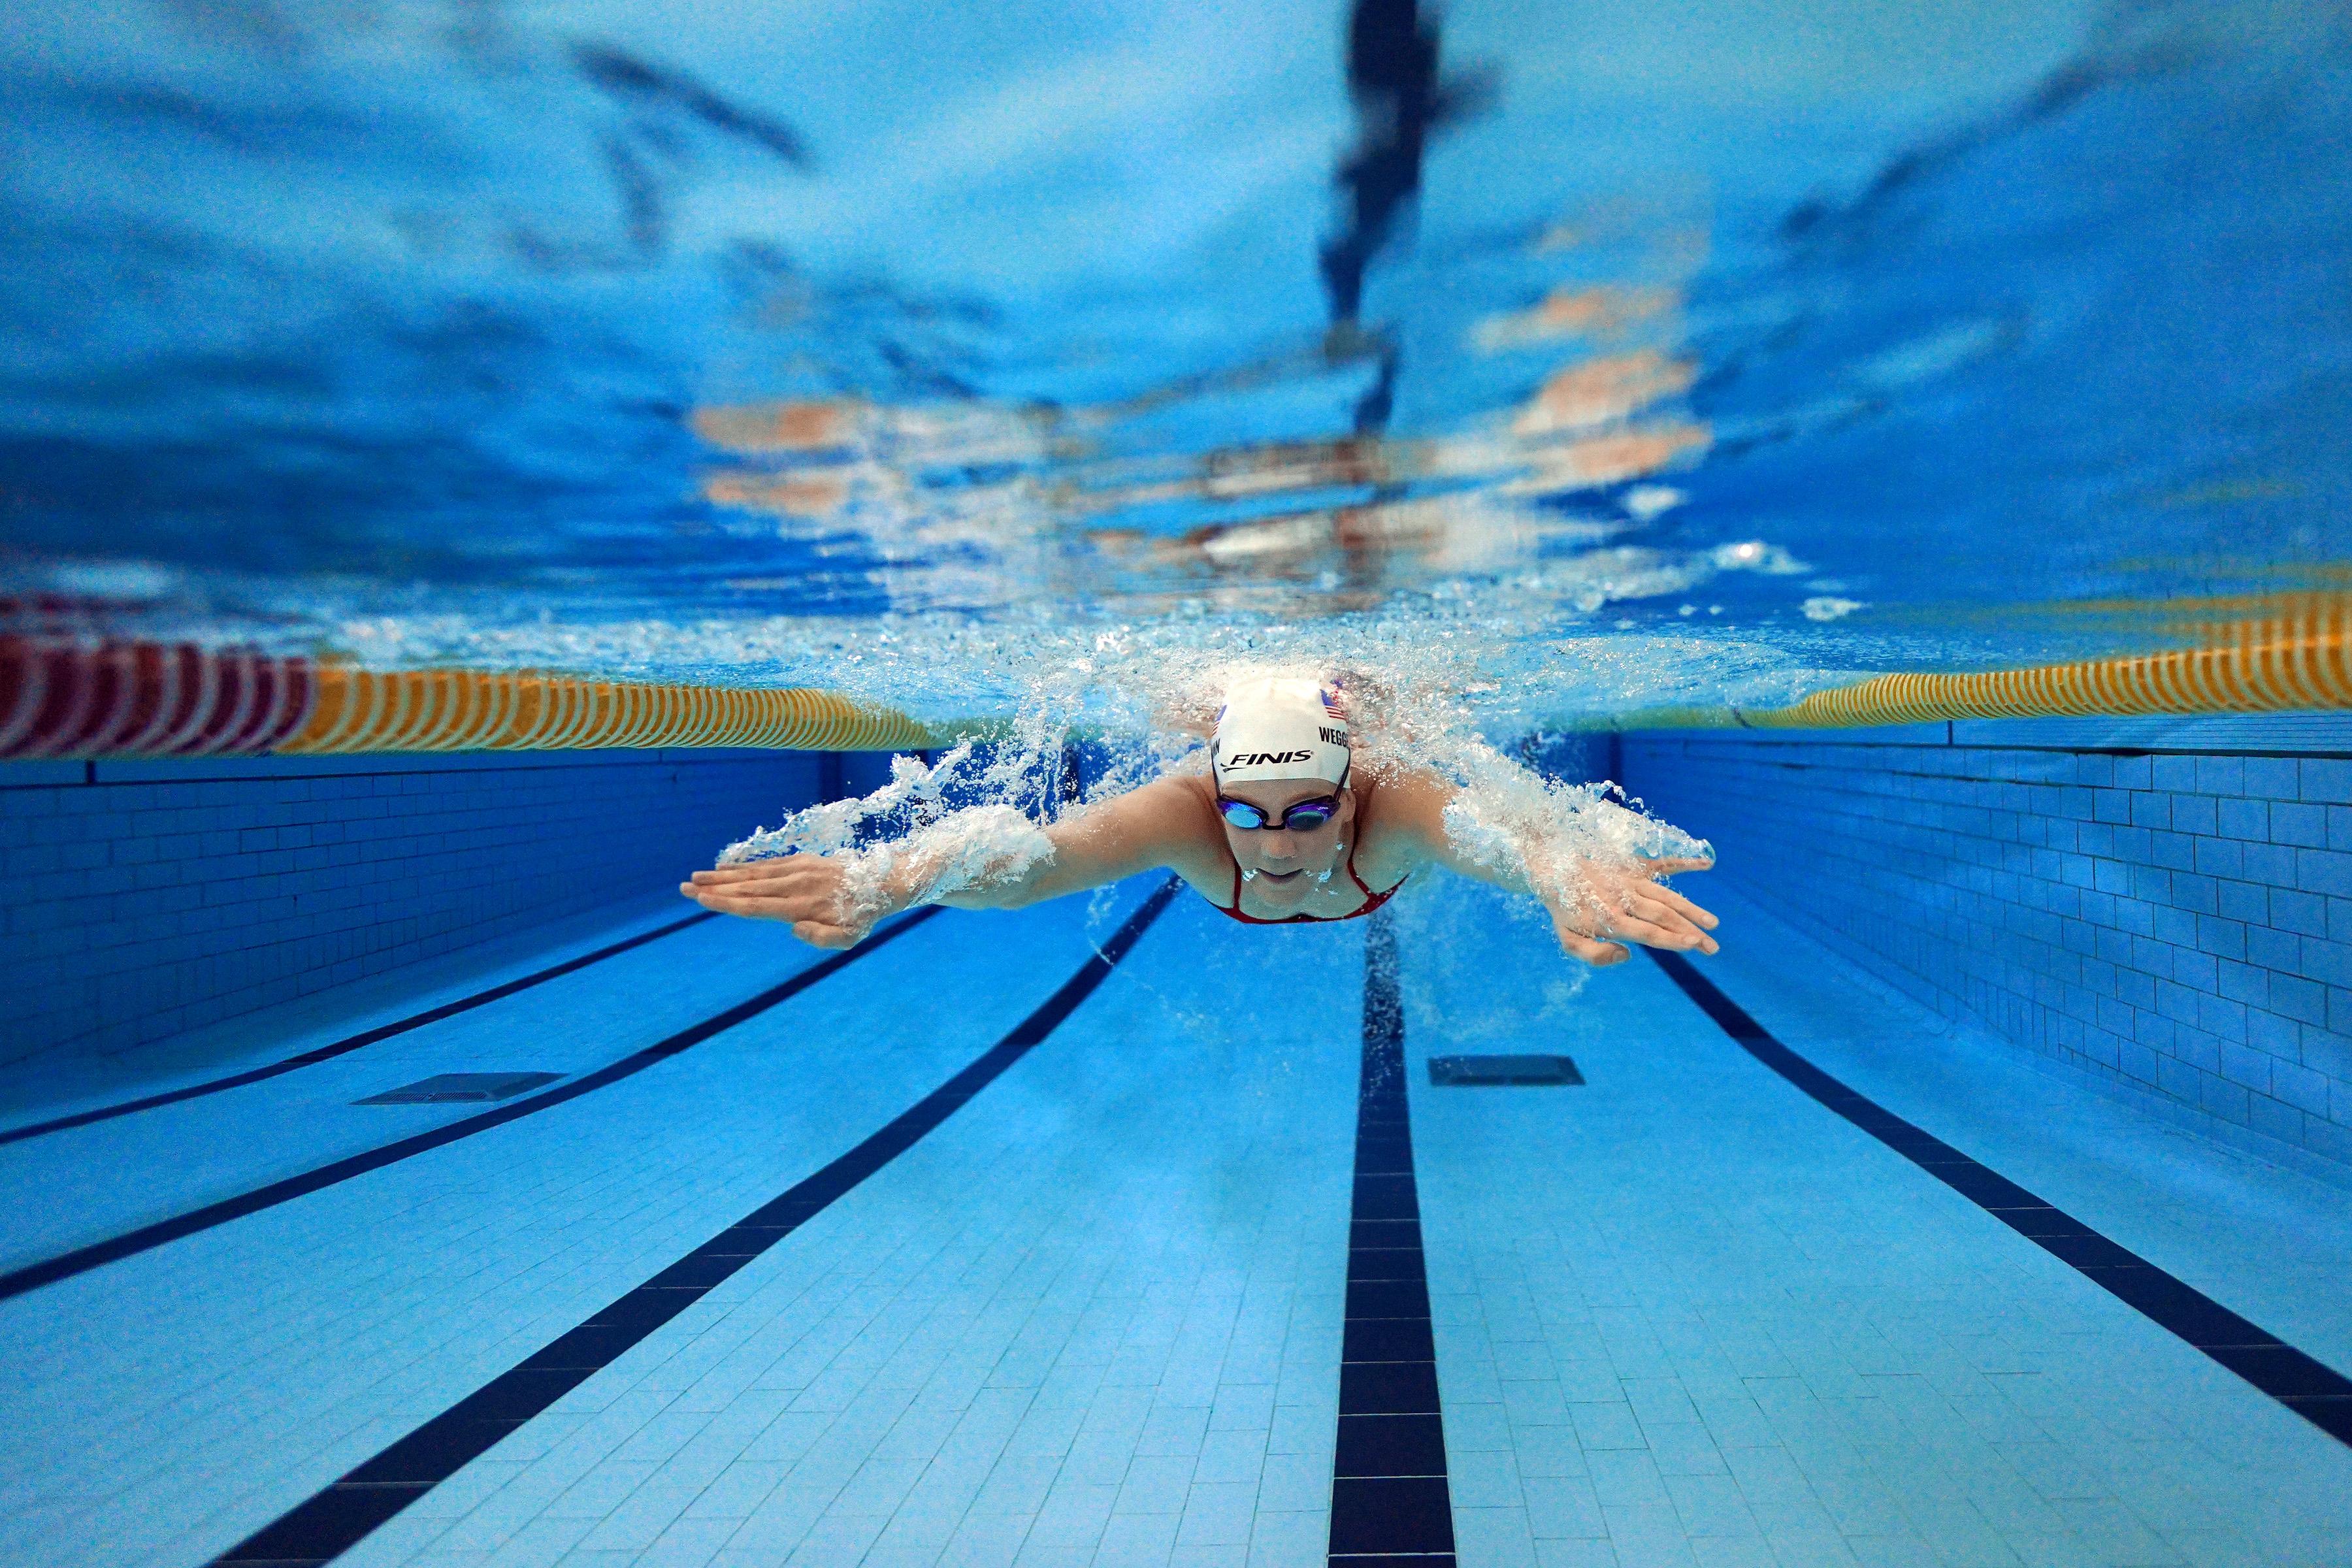 Paralympic swimmer Mallory Weggemann swam laps in a pool at the University of Minnesota.